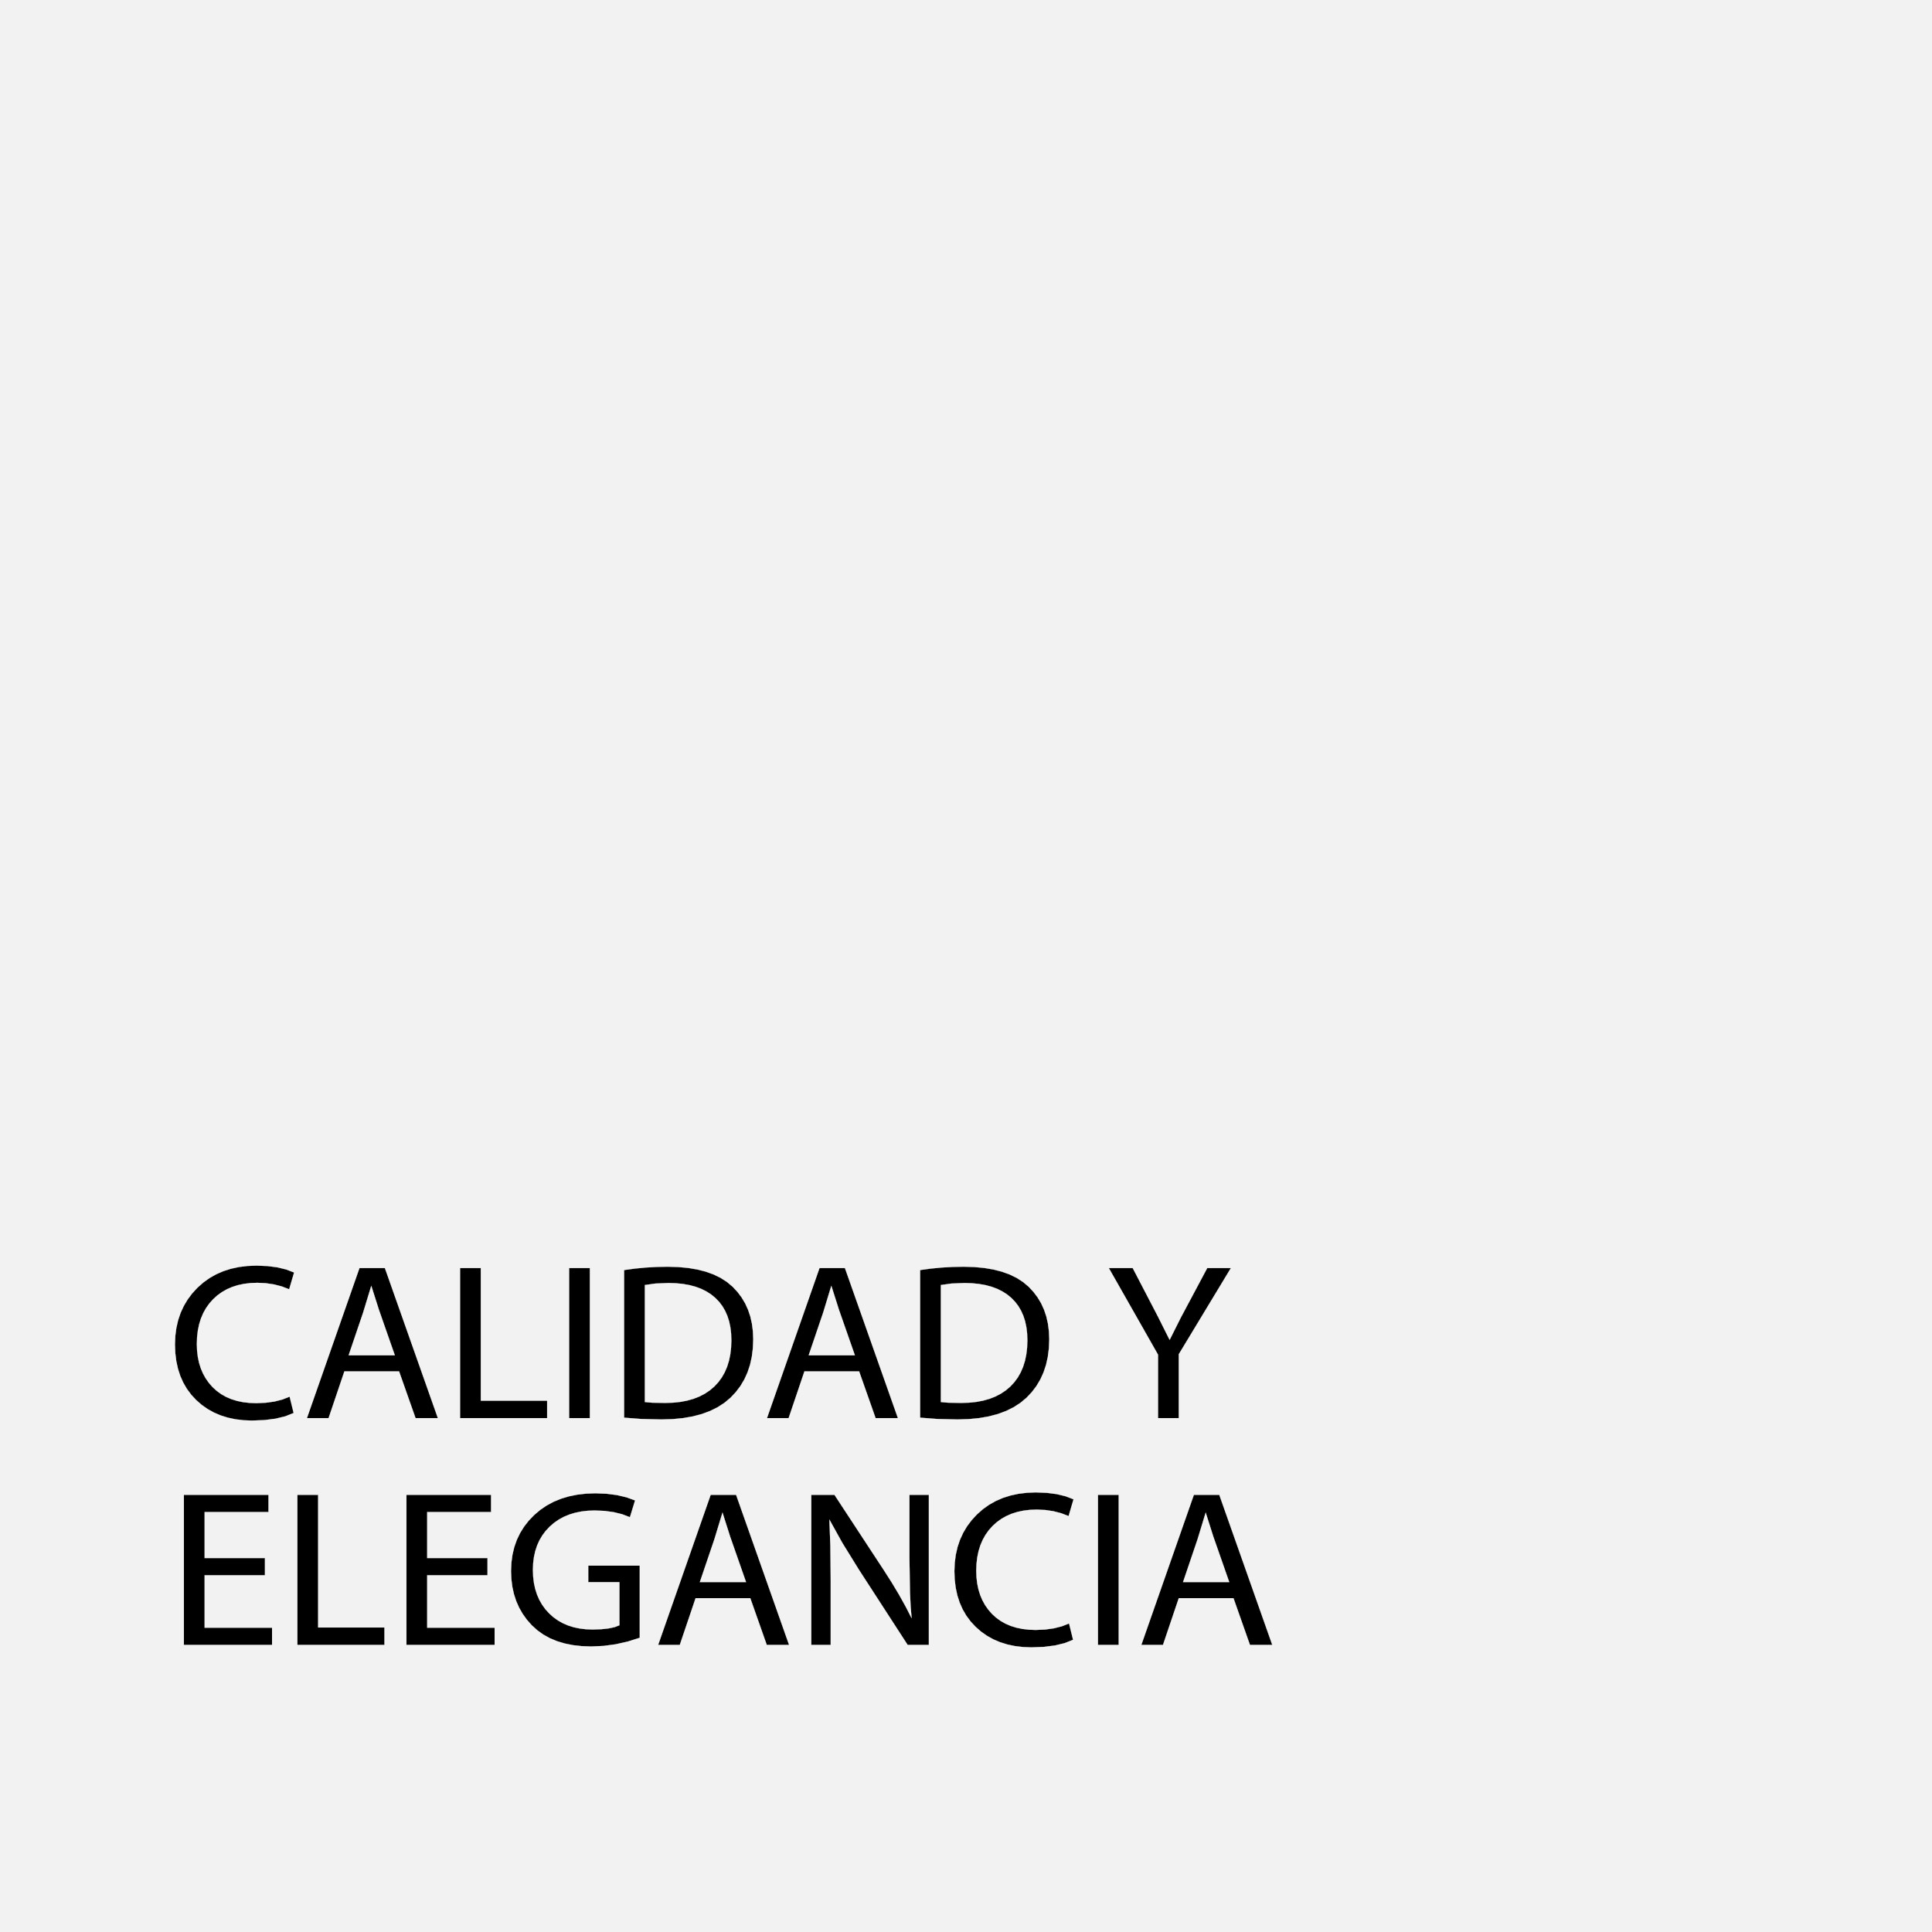 Calidad.jpg